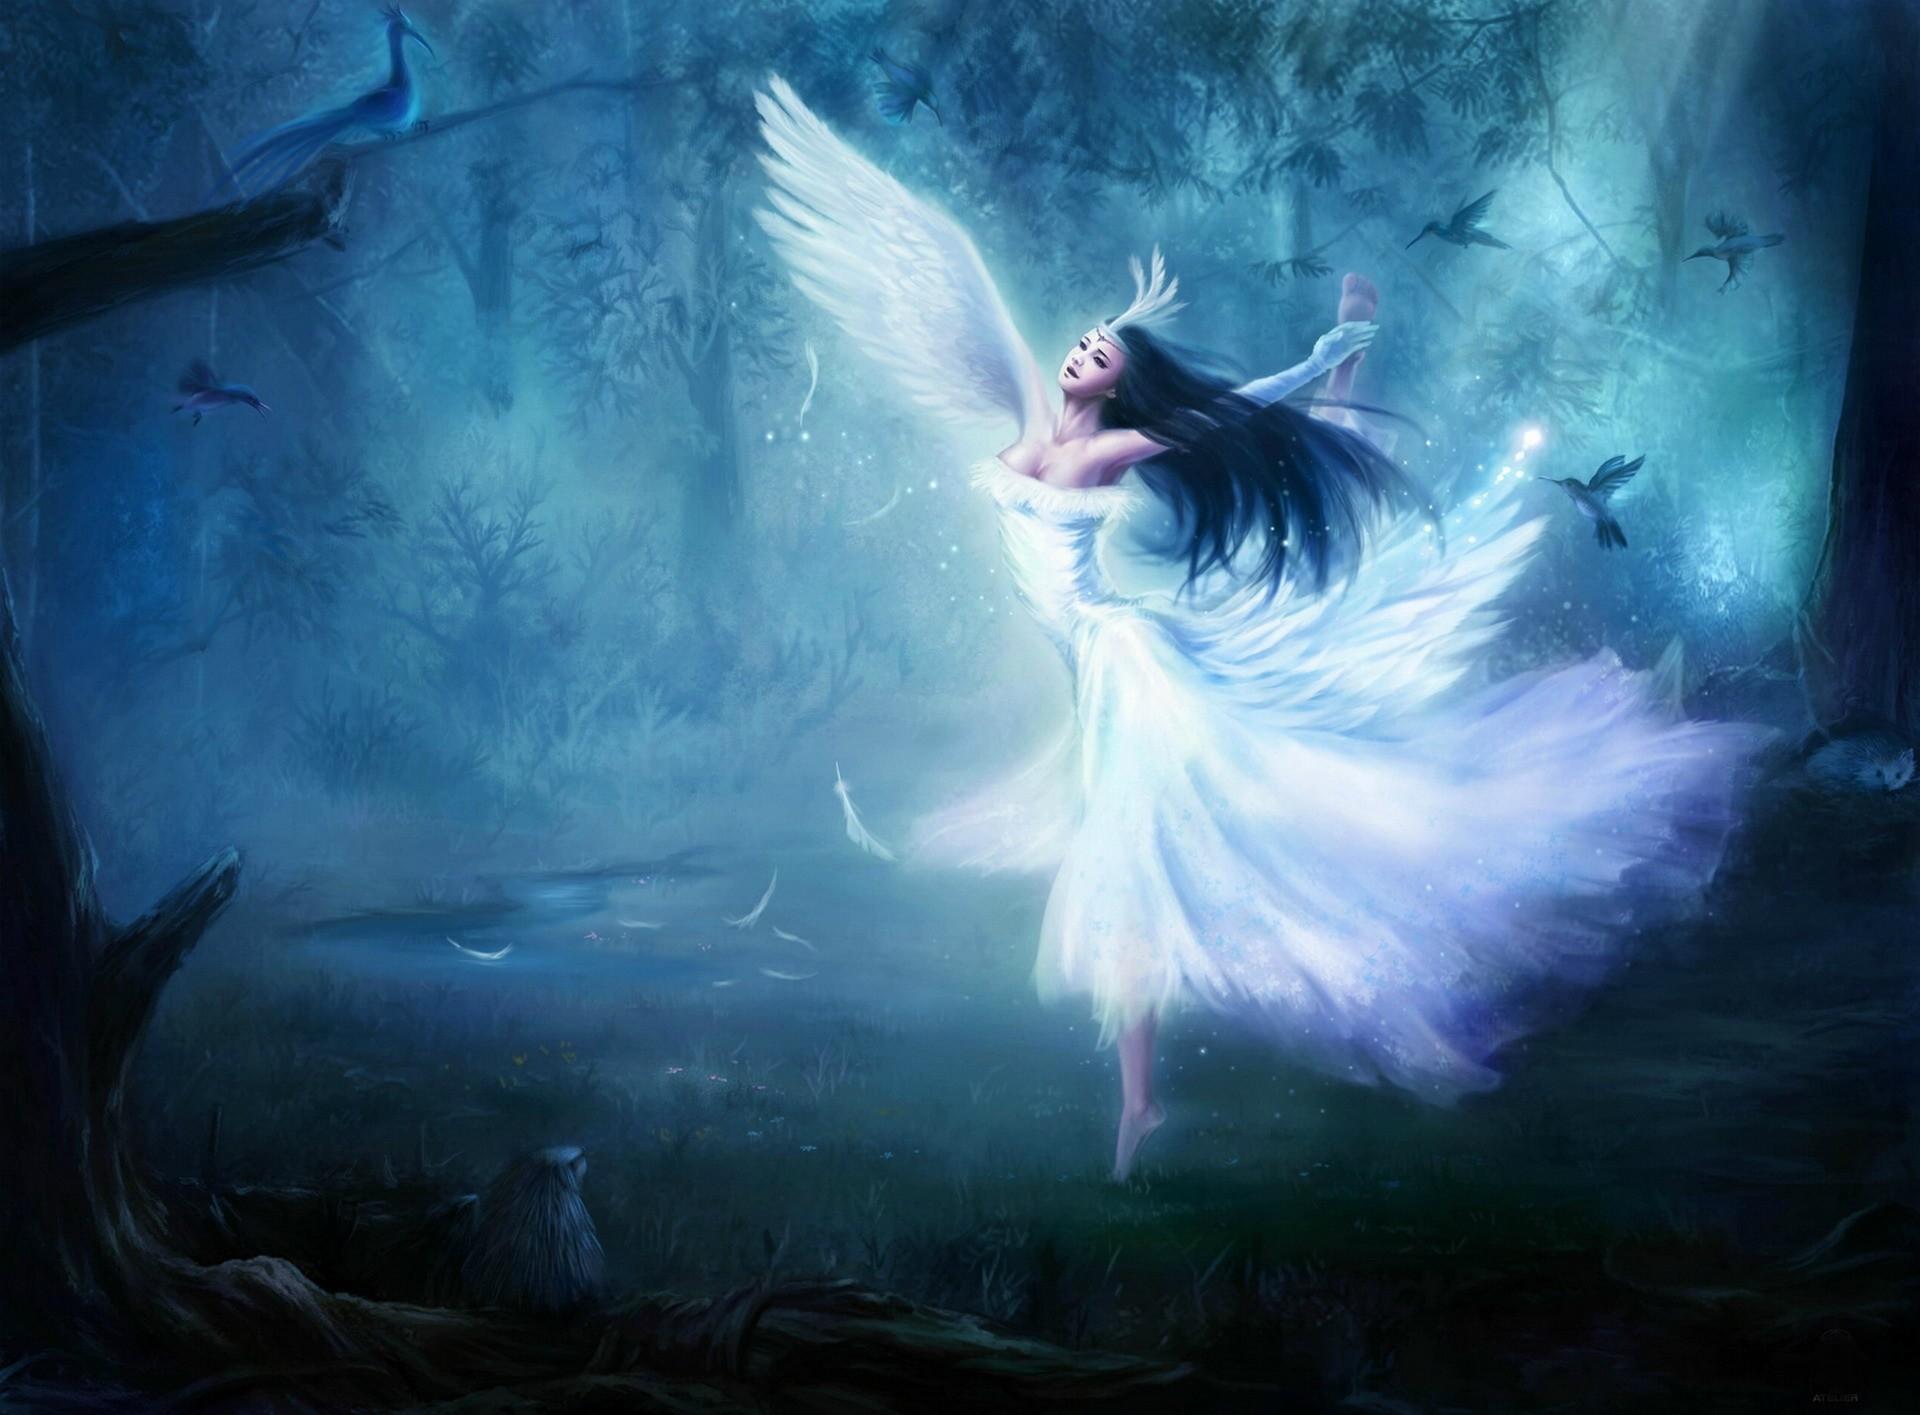 Fantasy Fairies Wallpaper | Fantasy Fairy Wallpaper/Background 1920 x 1415  – Id: 171003